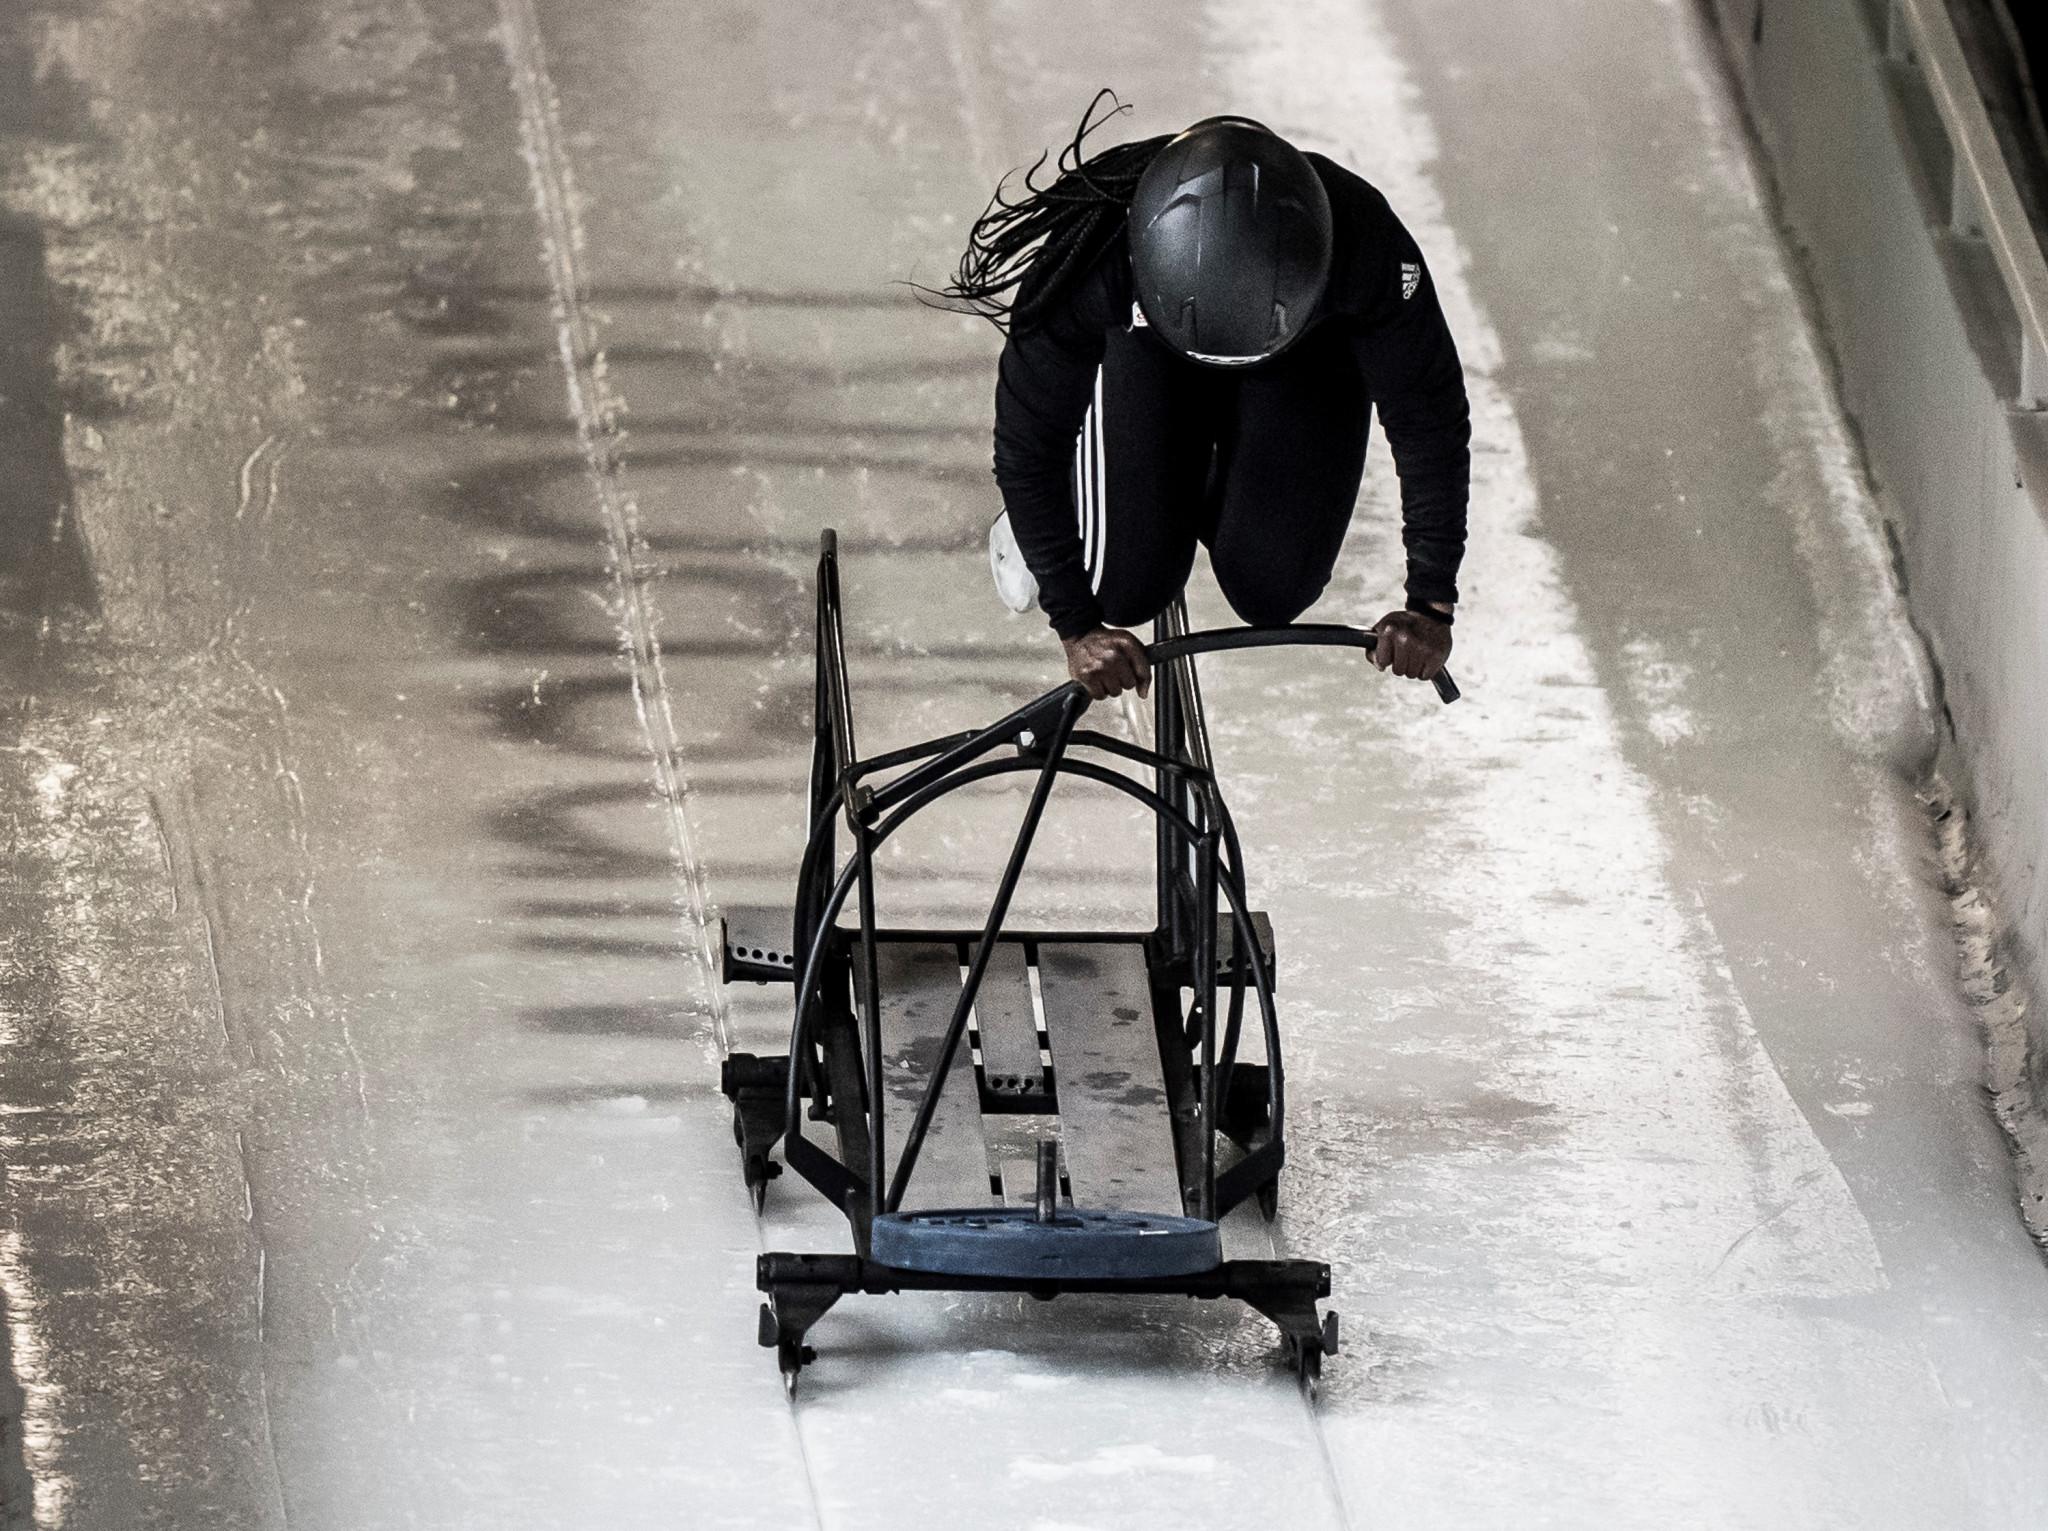 Cynthia s'entraîne sur la piste de bobsleigh.